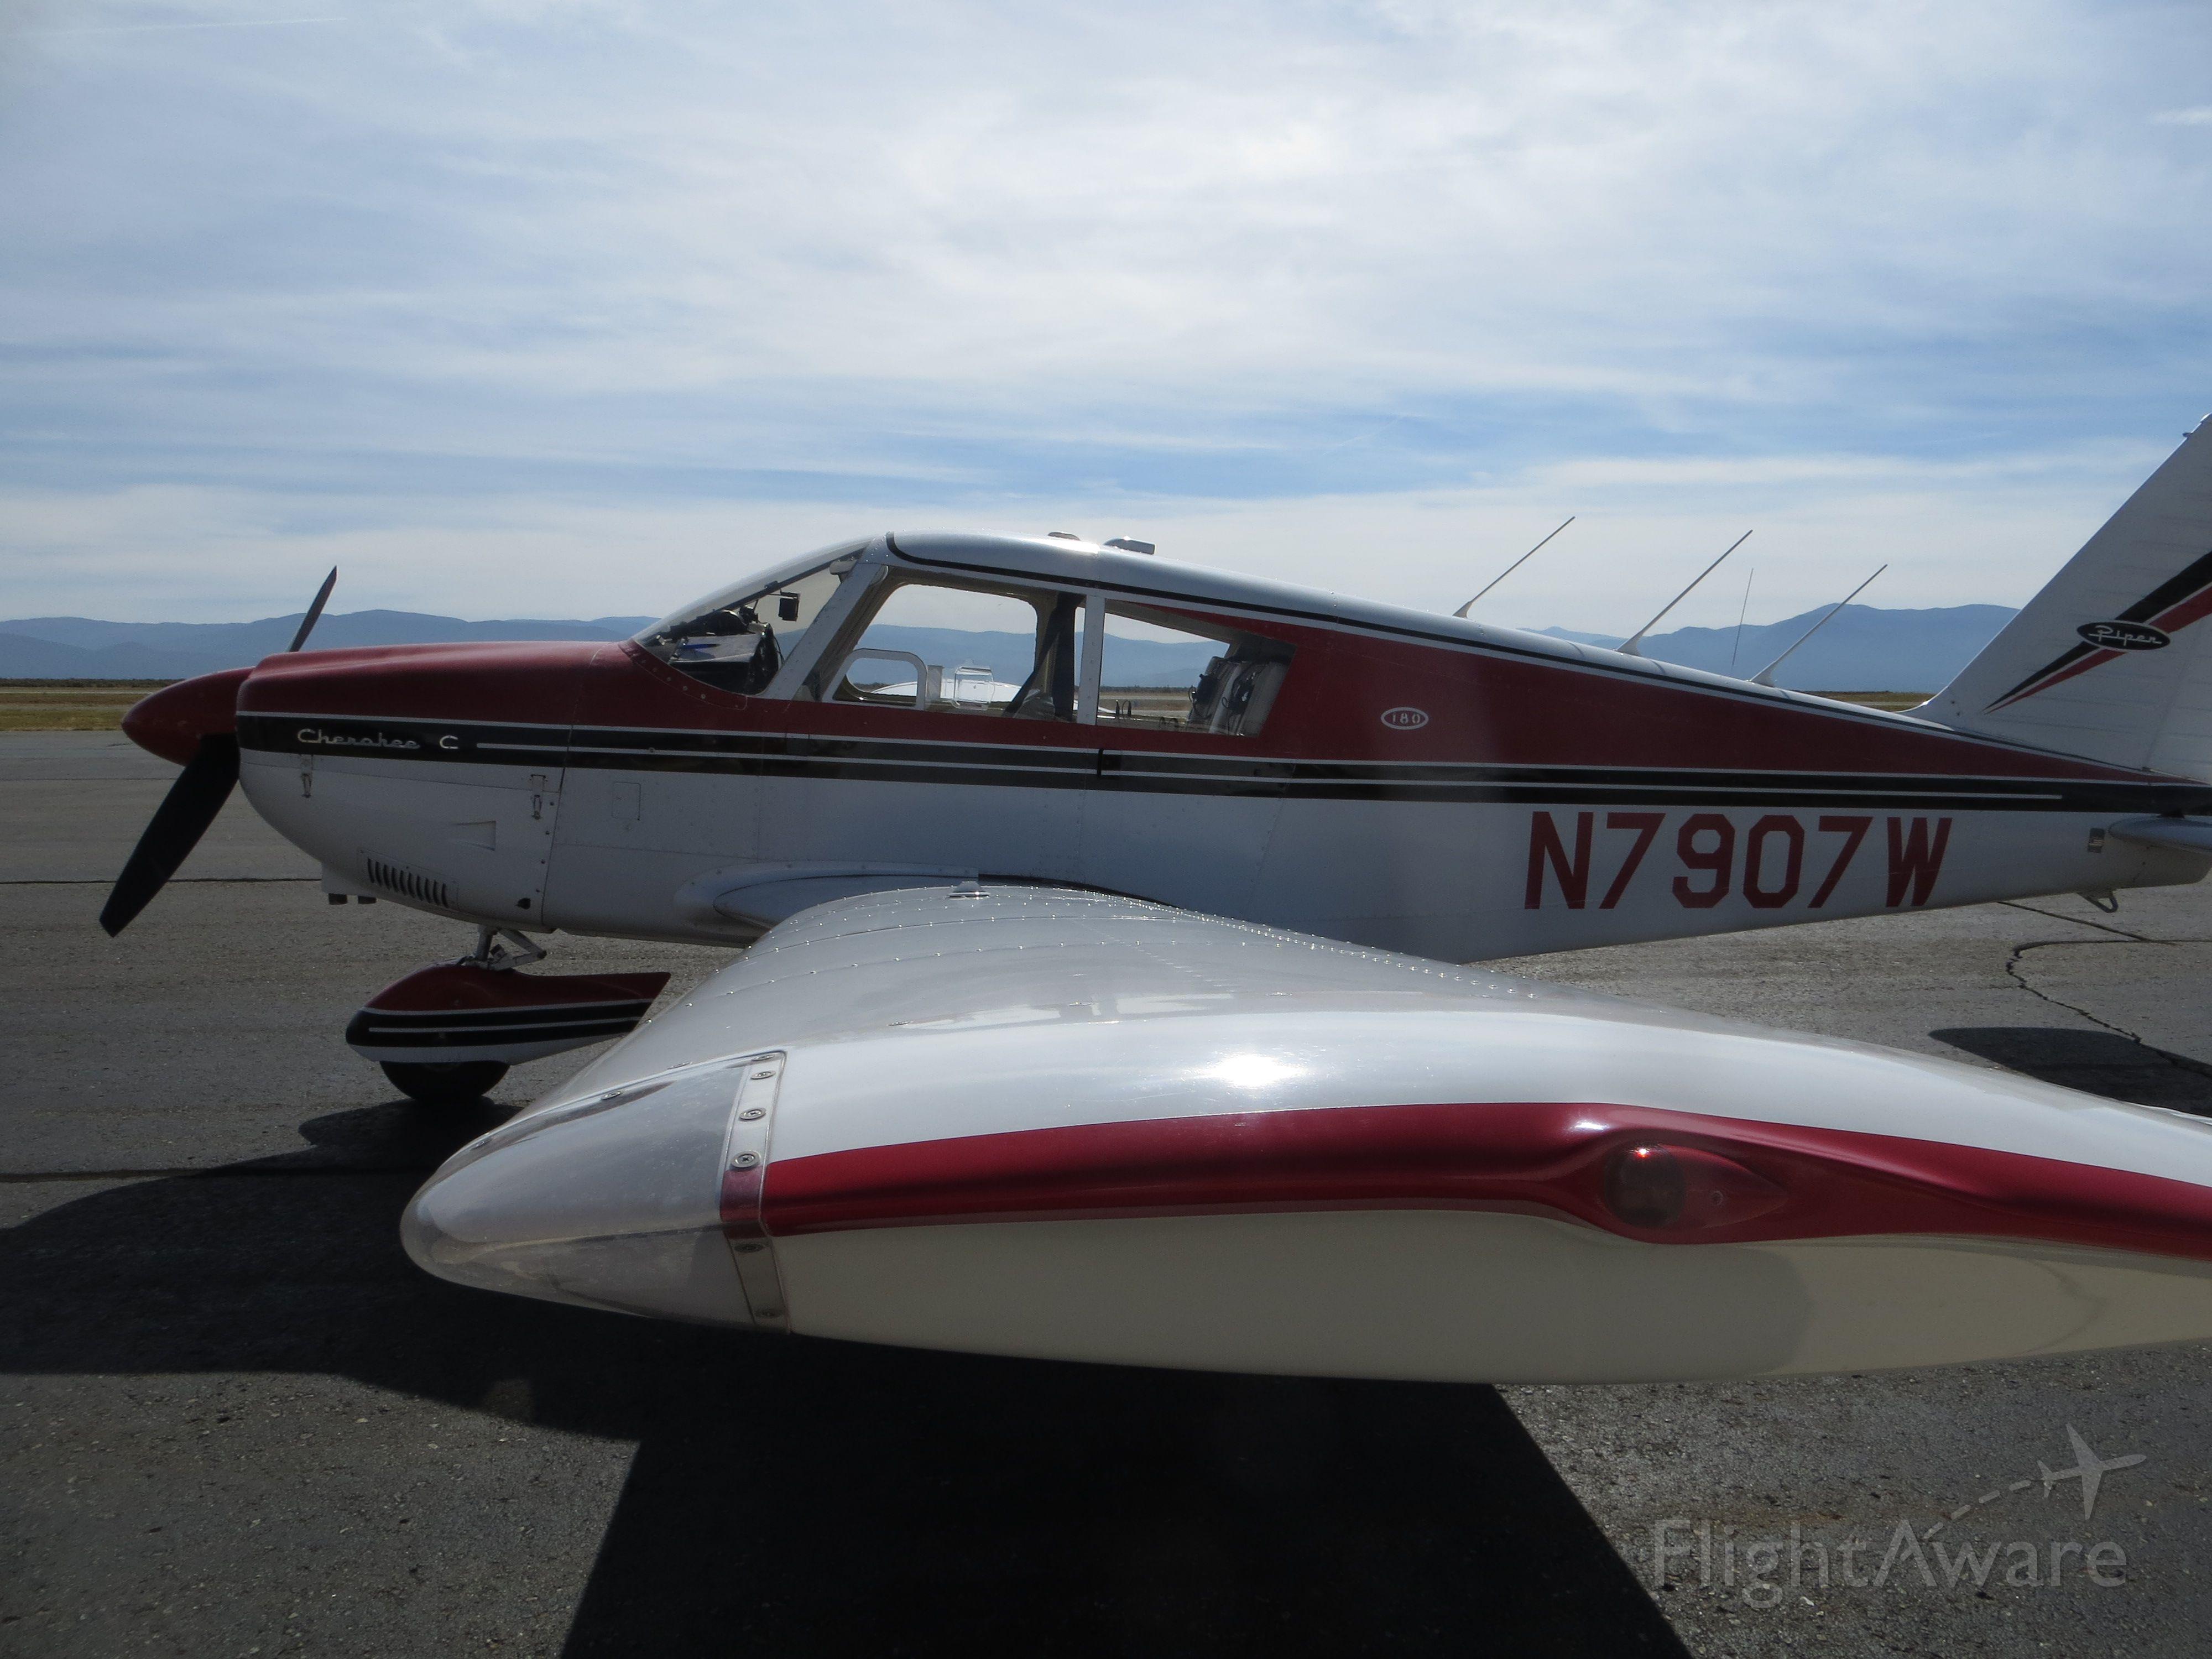 Piper Dakota / Pathfinder (N7907W)